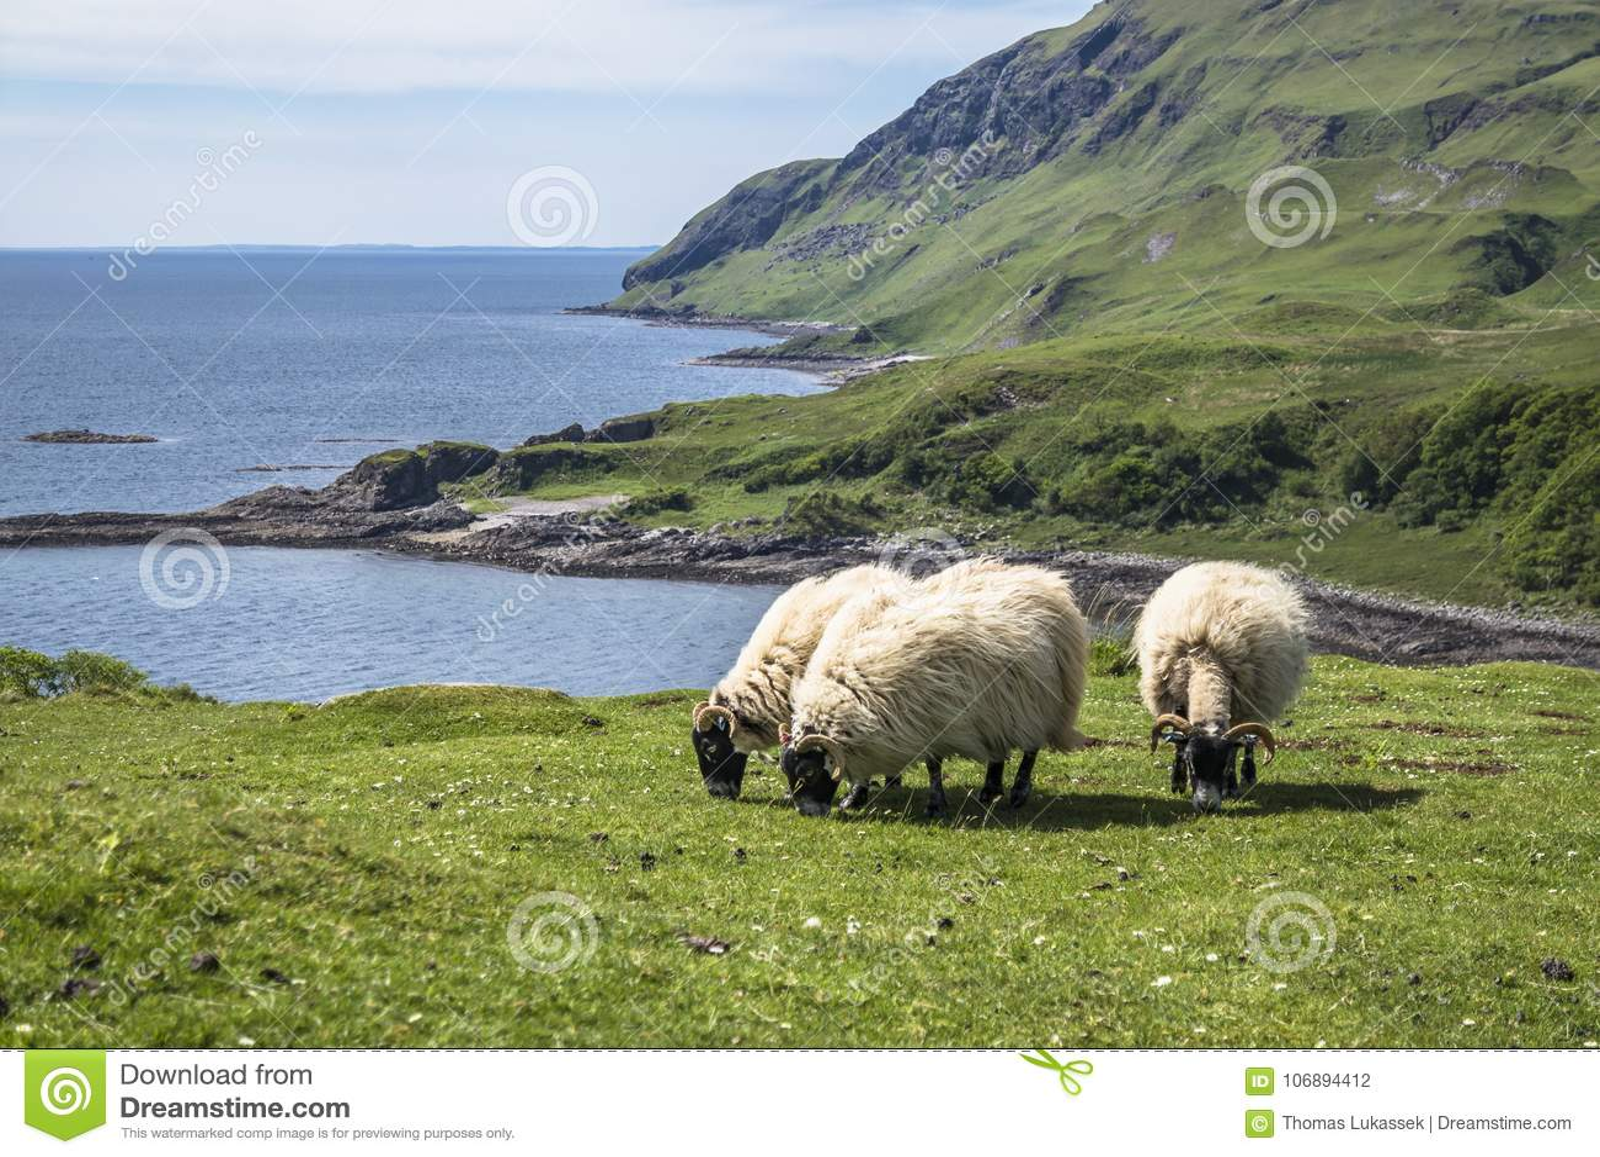 Sheep and goat at the bay called Camas nan Geall, Ardnamurchan